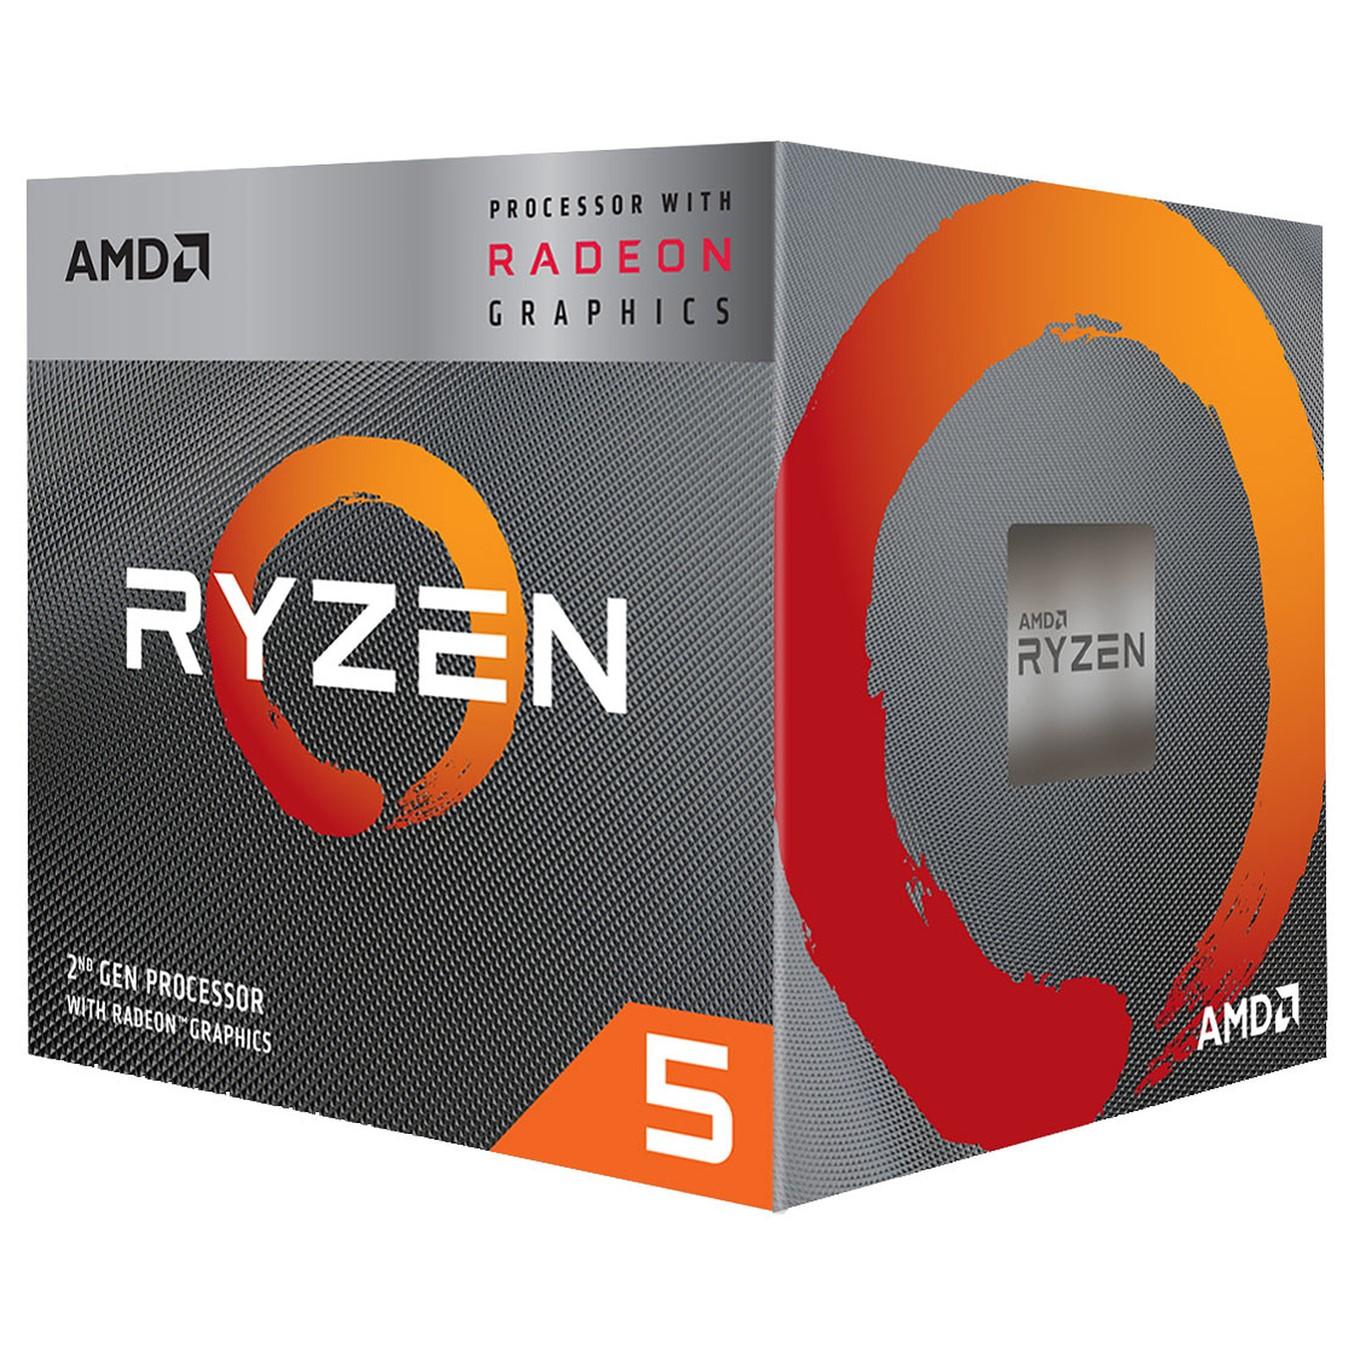 MICRO. PROCESADOR AMD RYZEN 5 3400G 3.7GHZ 4MB AM4